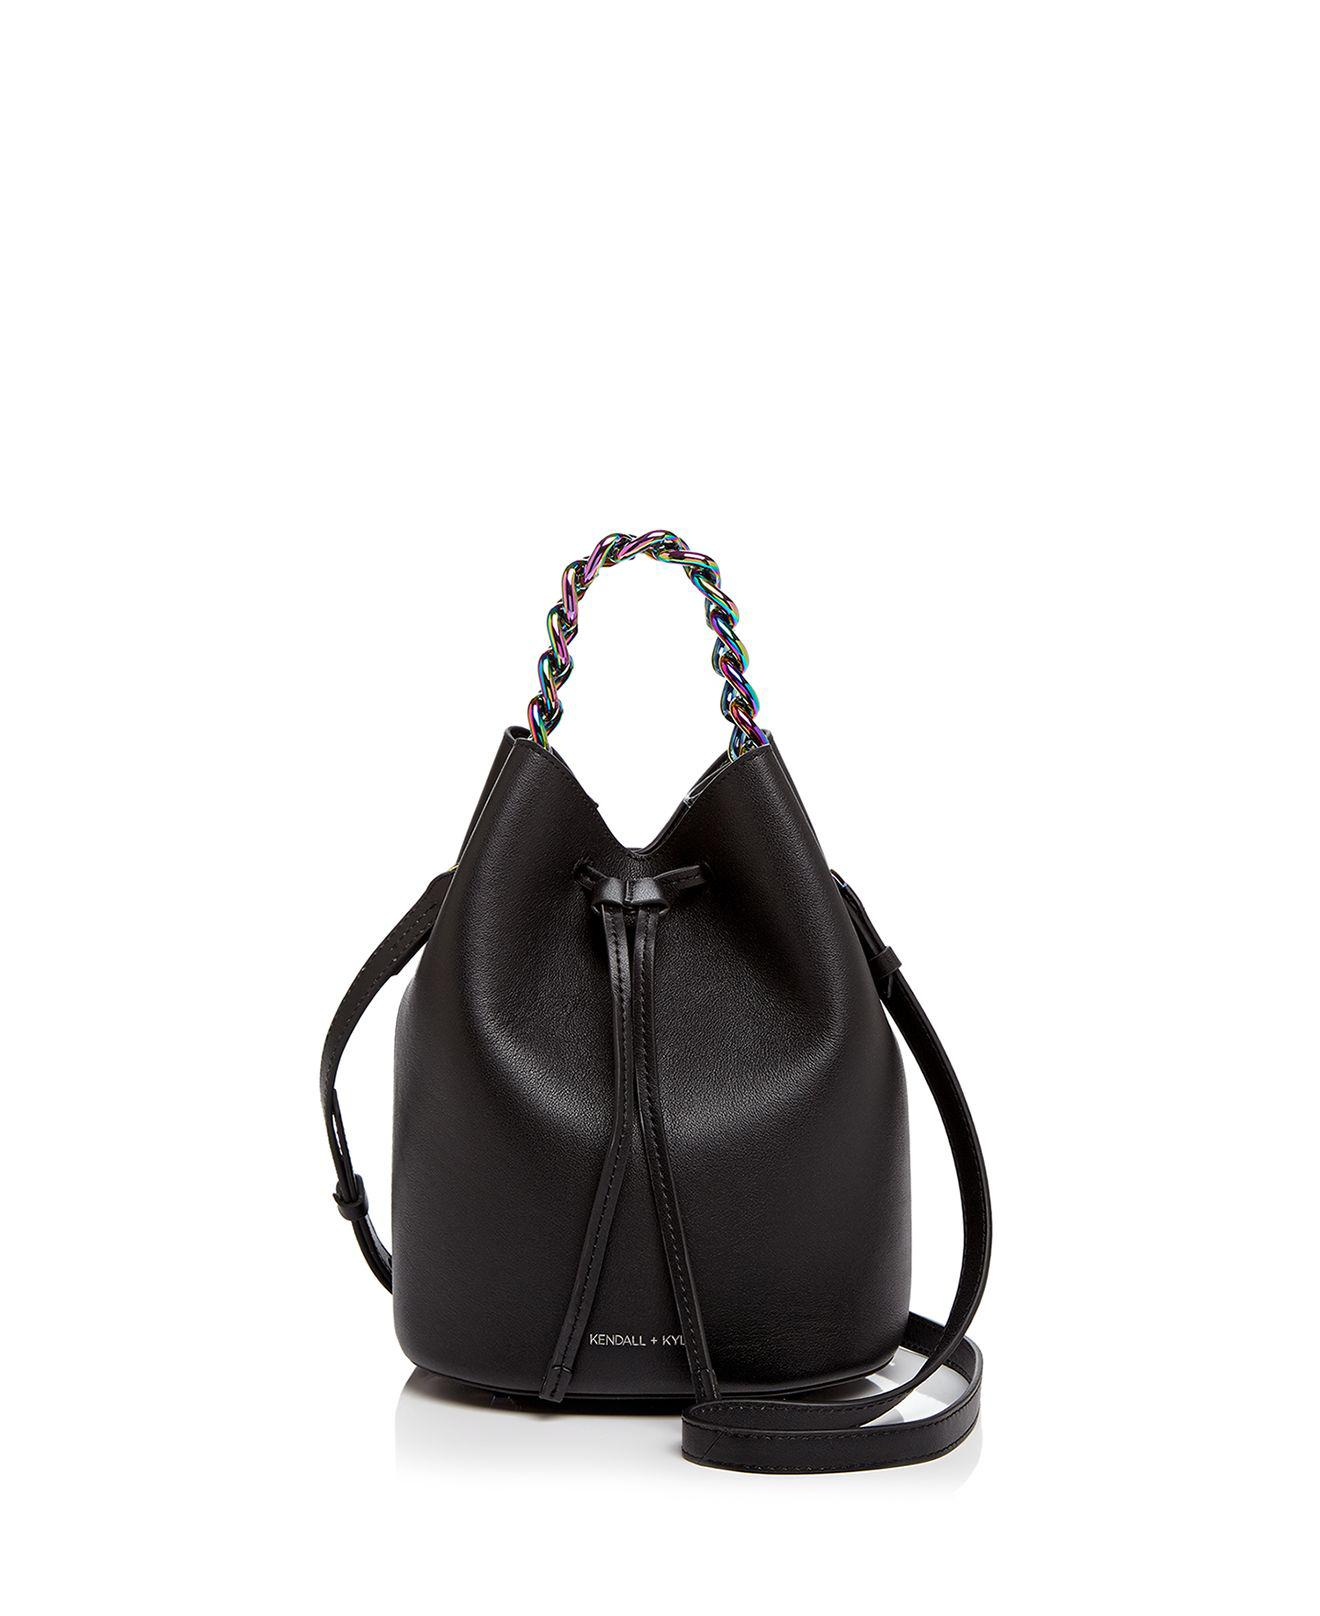 8d8154dd9f Lyst - Kendall + Kylie Ladie Mini Bucket Bag in Black